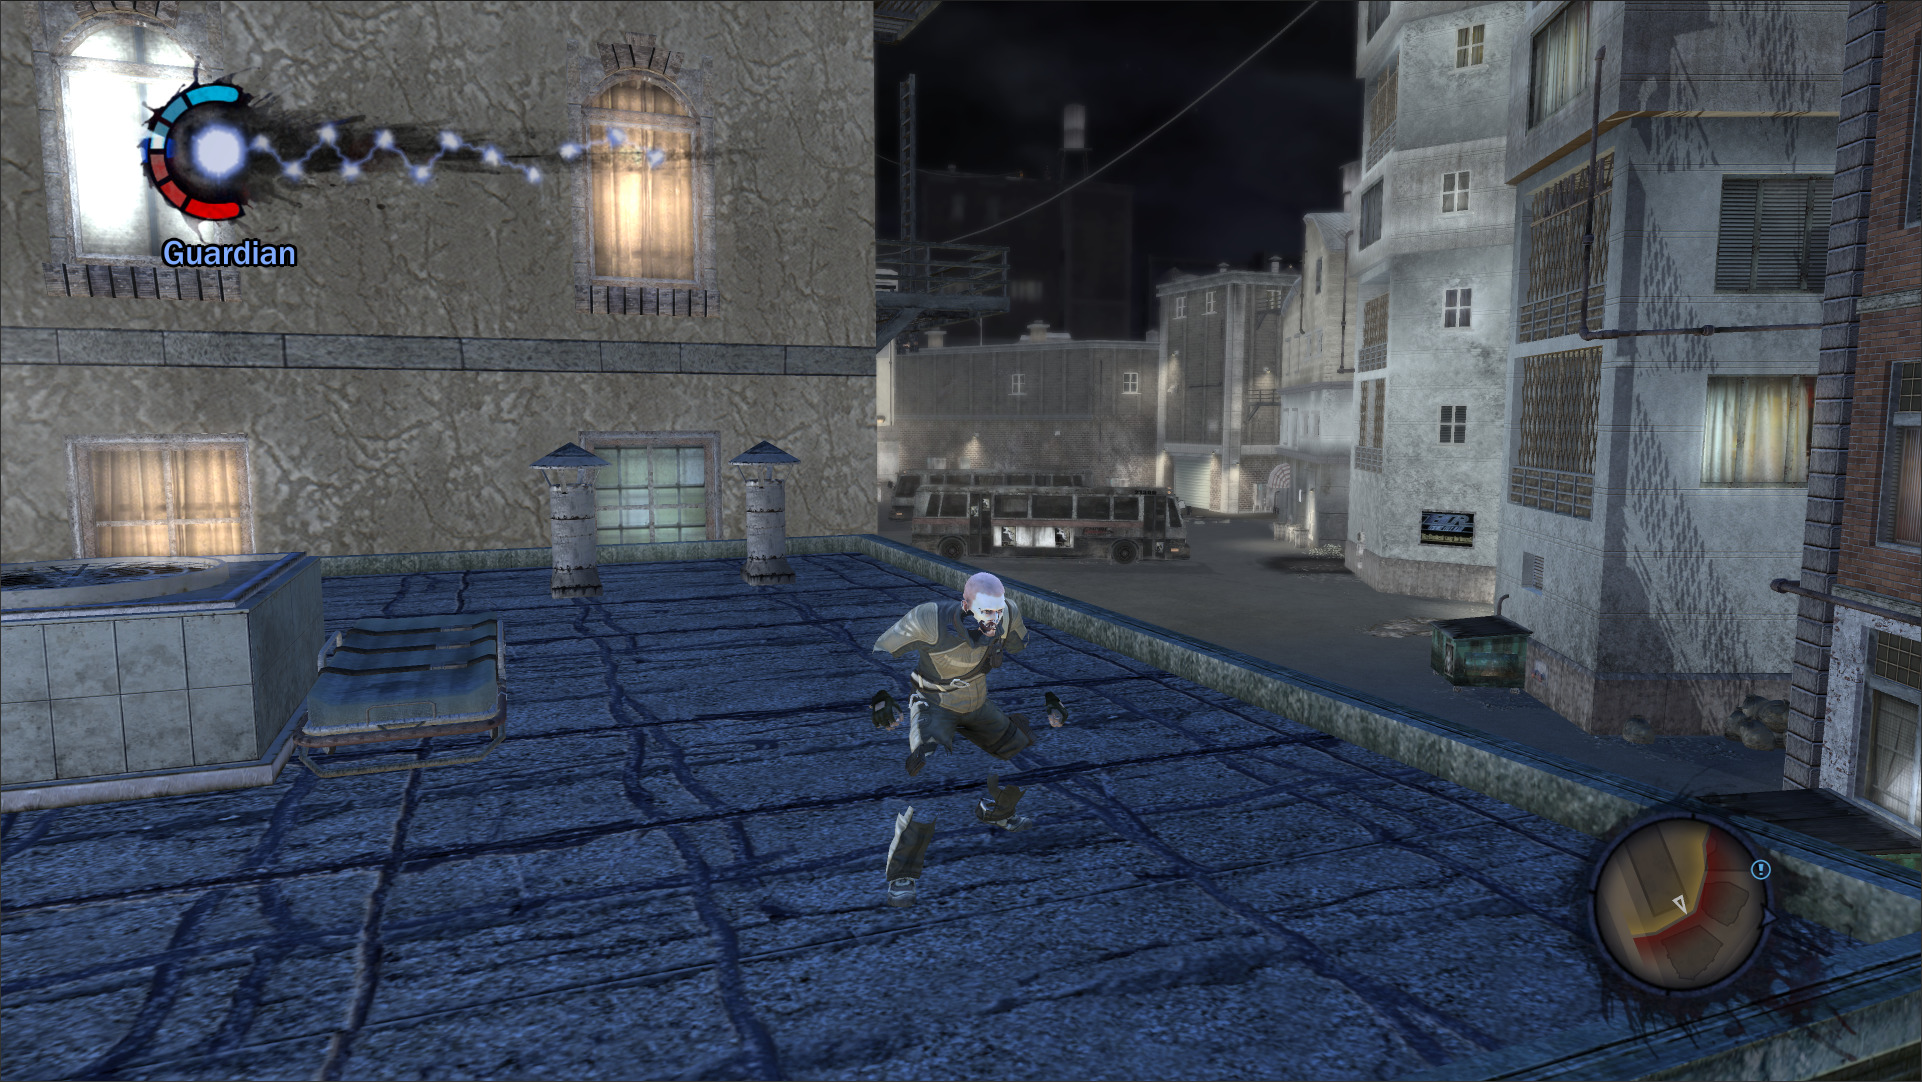 Infamous pc emulator